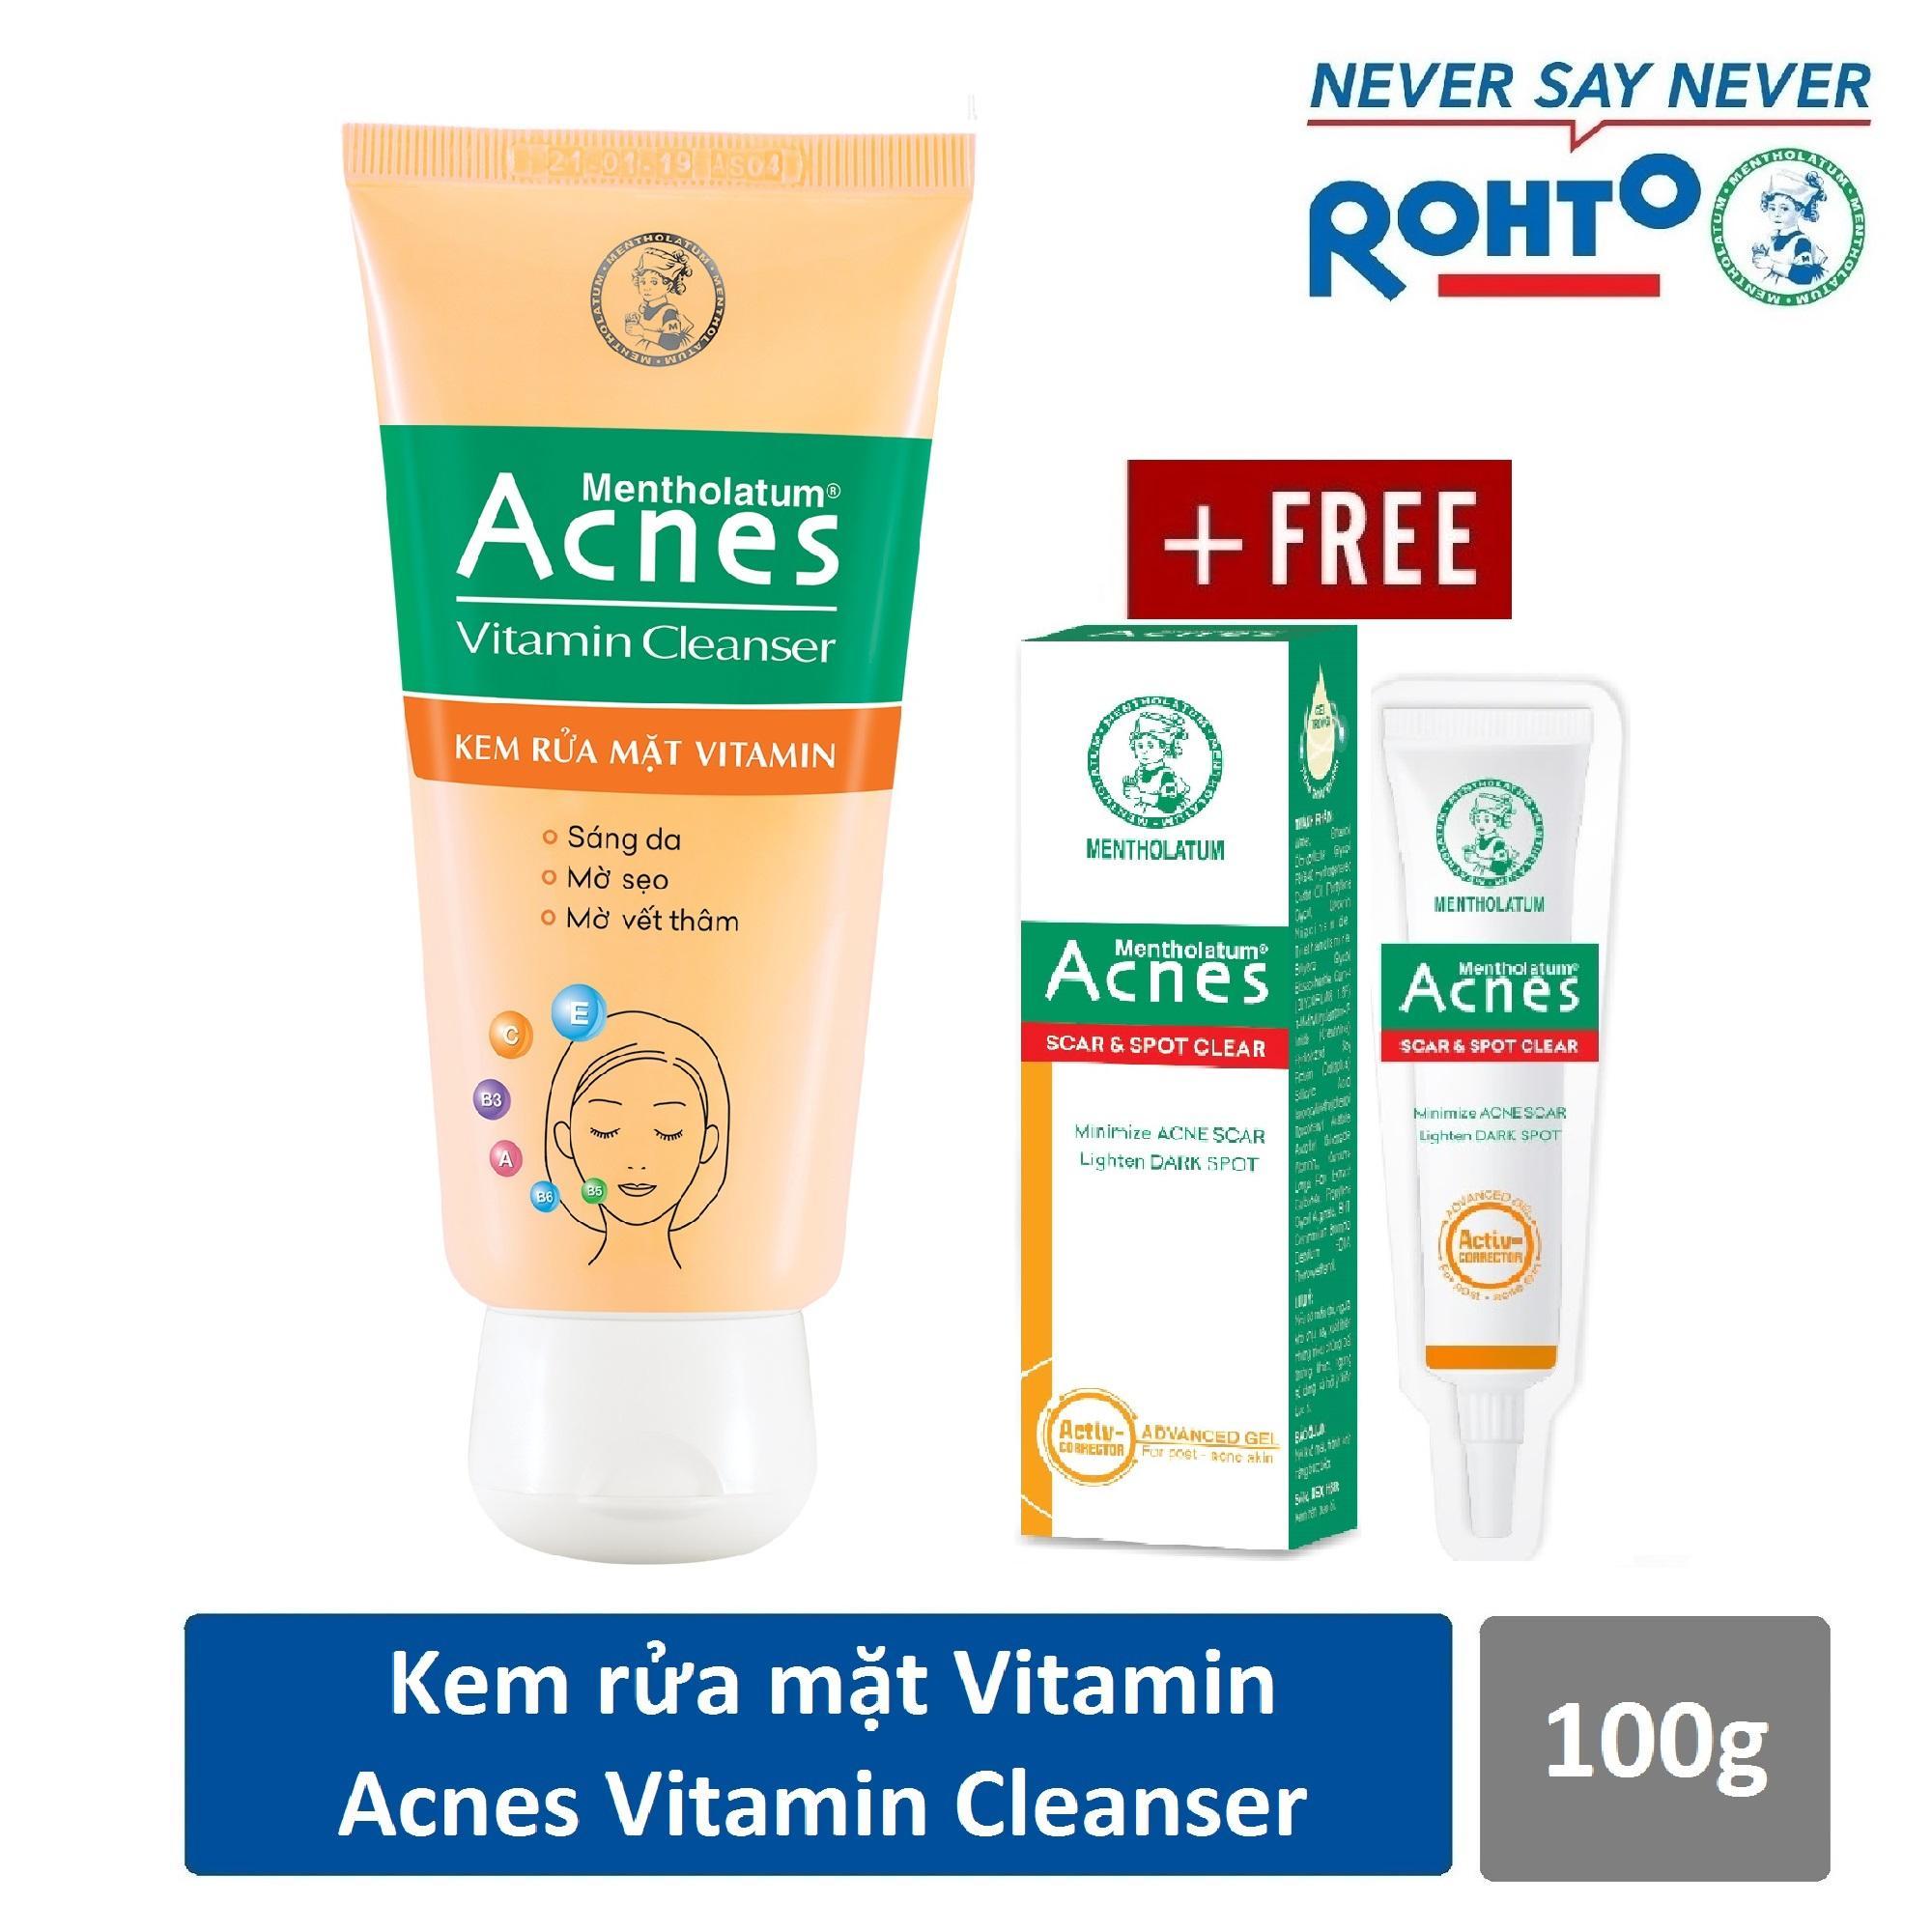 Hình ảnh Kem rửa mặt VITAMIN ACNES VITAMIN Cleanser 100g + Gel sáng thâm mờ sẹo Acnes Scar and Spot Clear 2g